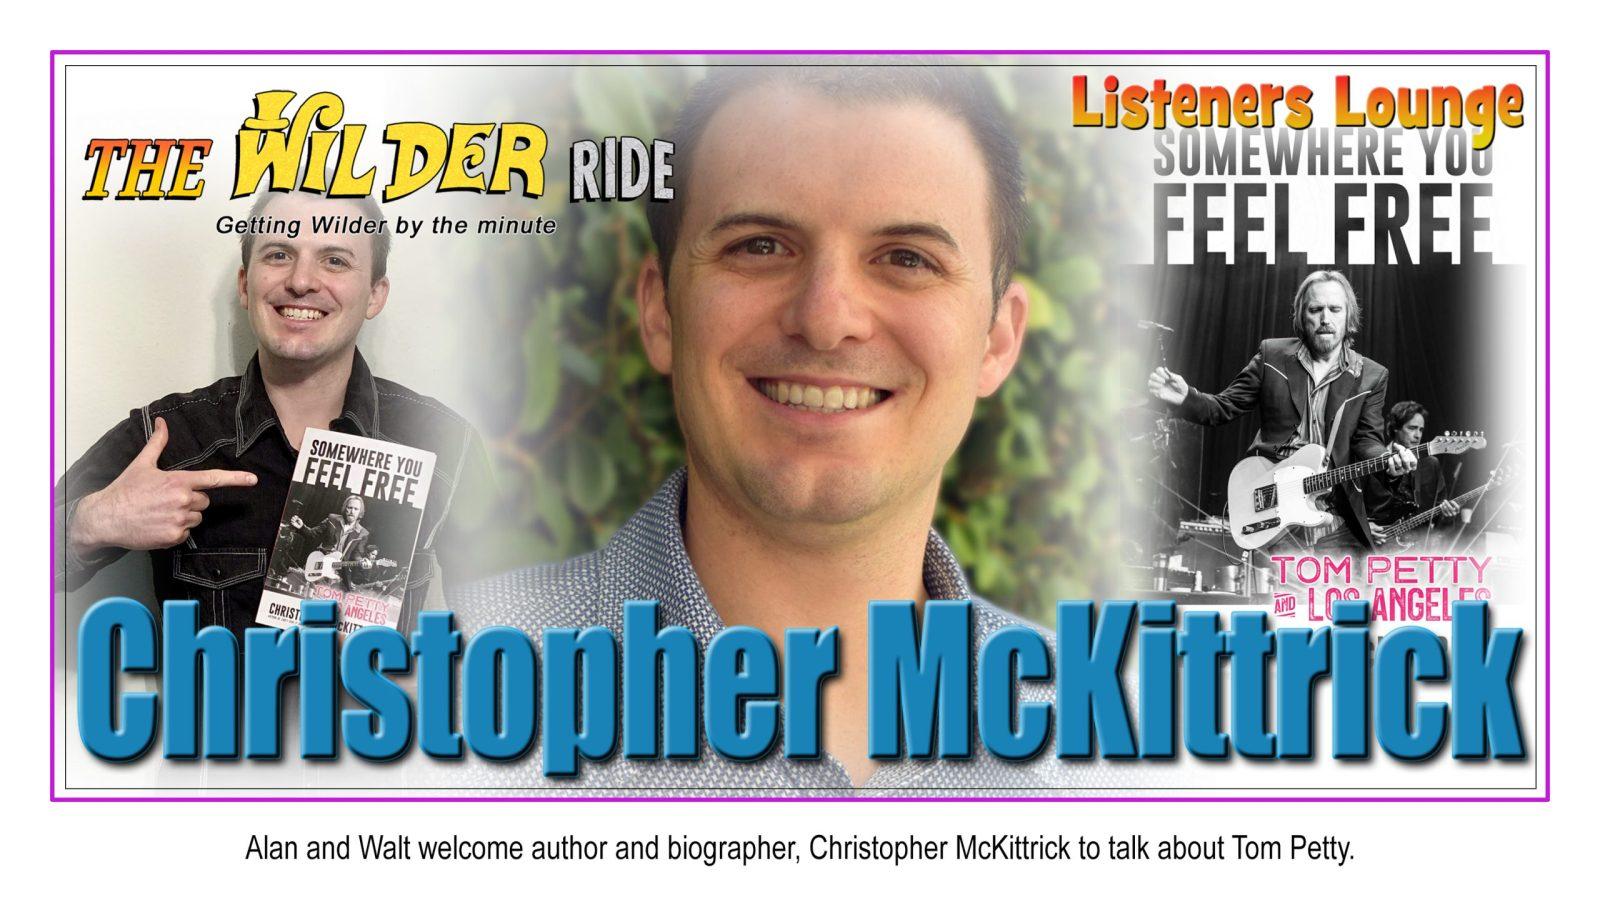 Christopher McKittrick